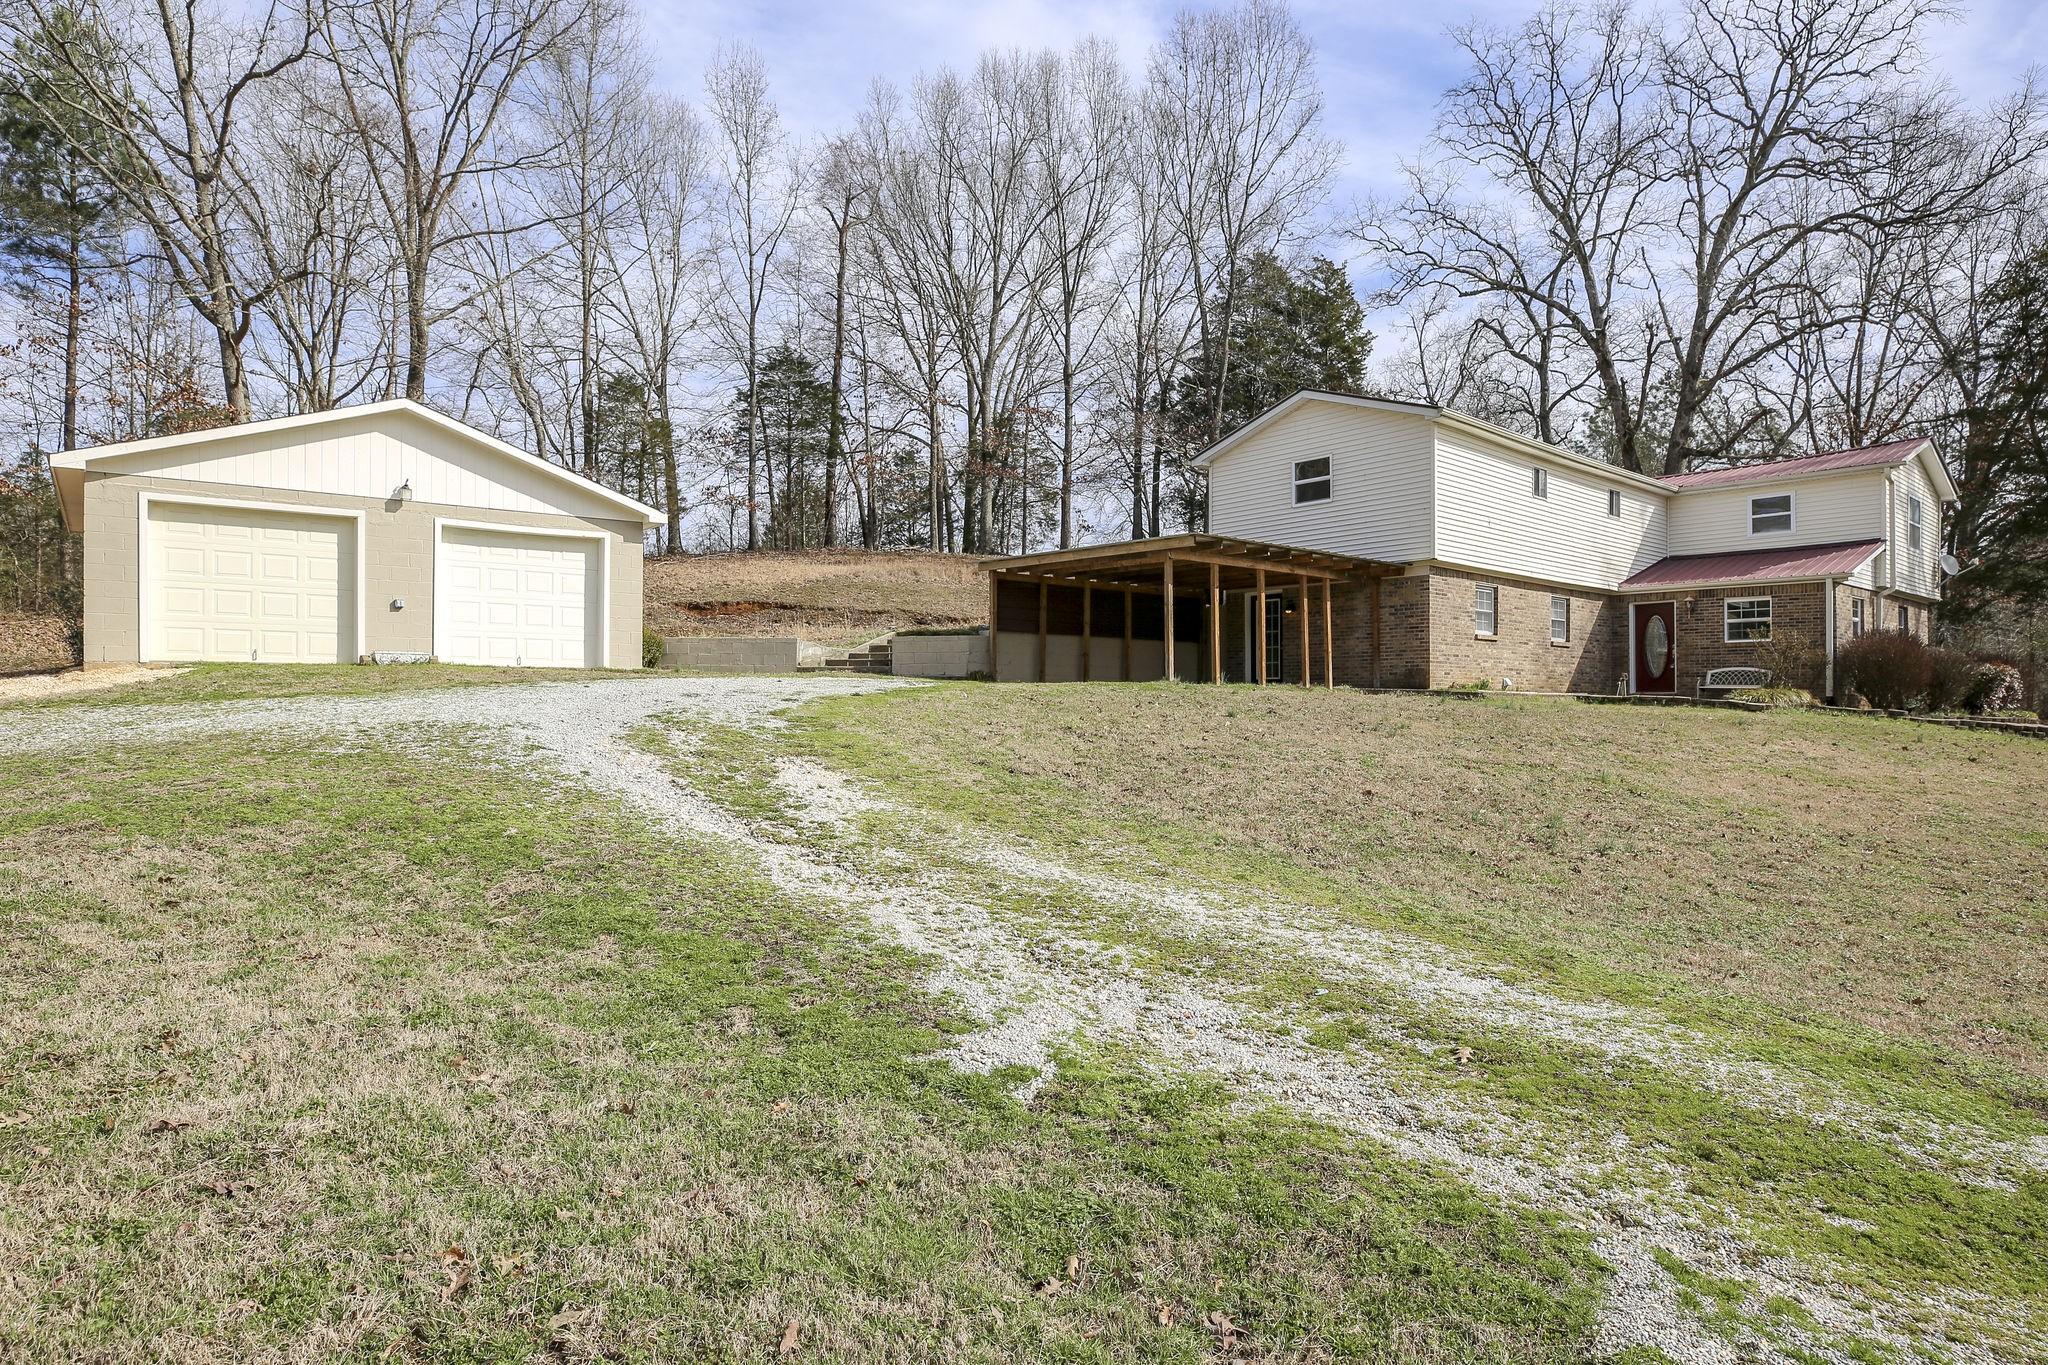 335 Eva Harbor Rd, Eva, TN 38333 - Eva, TN real estate listing